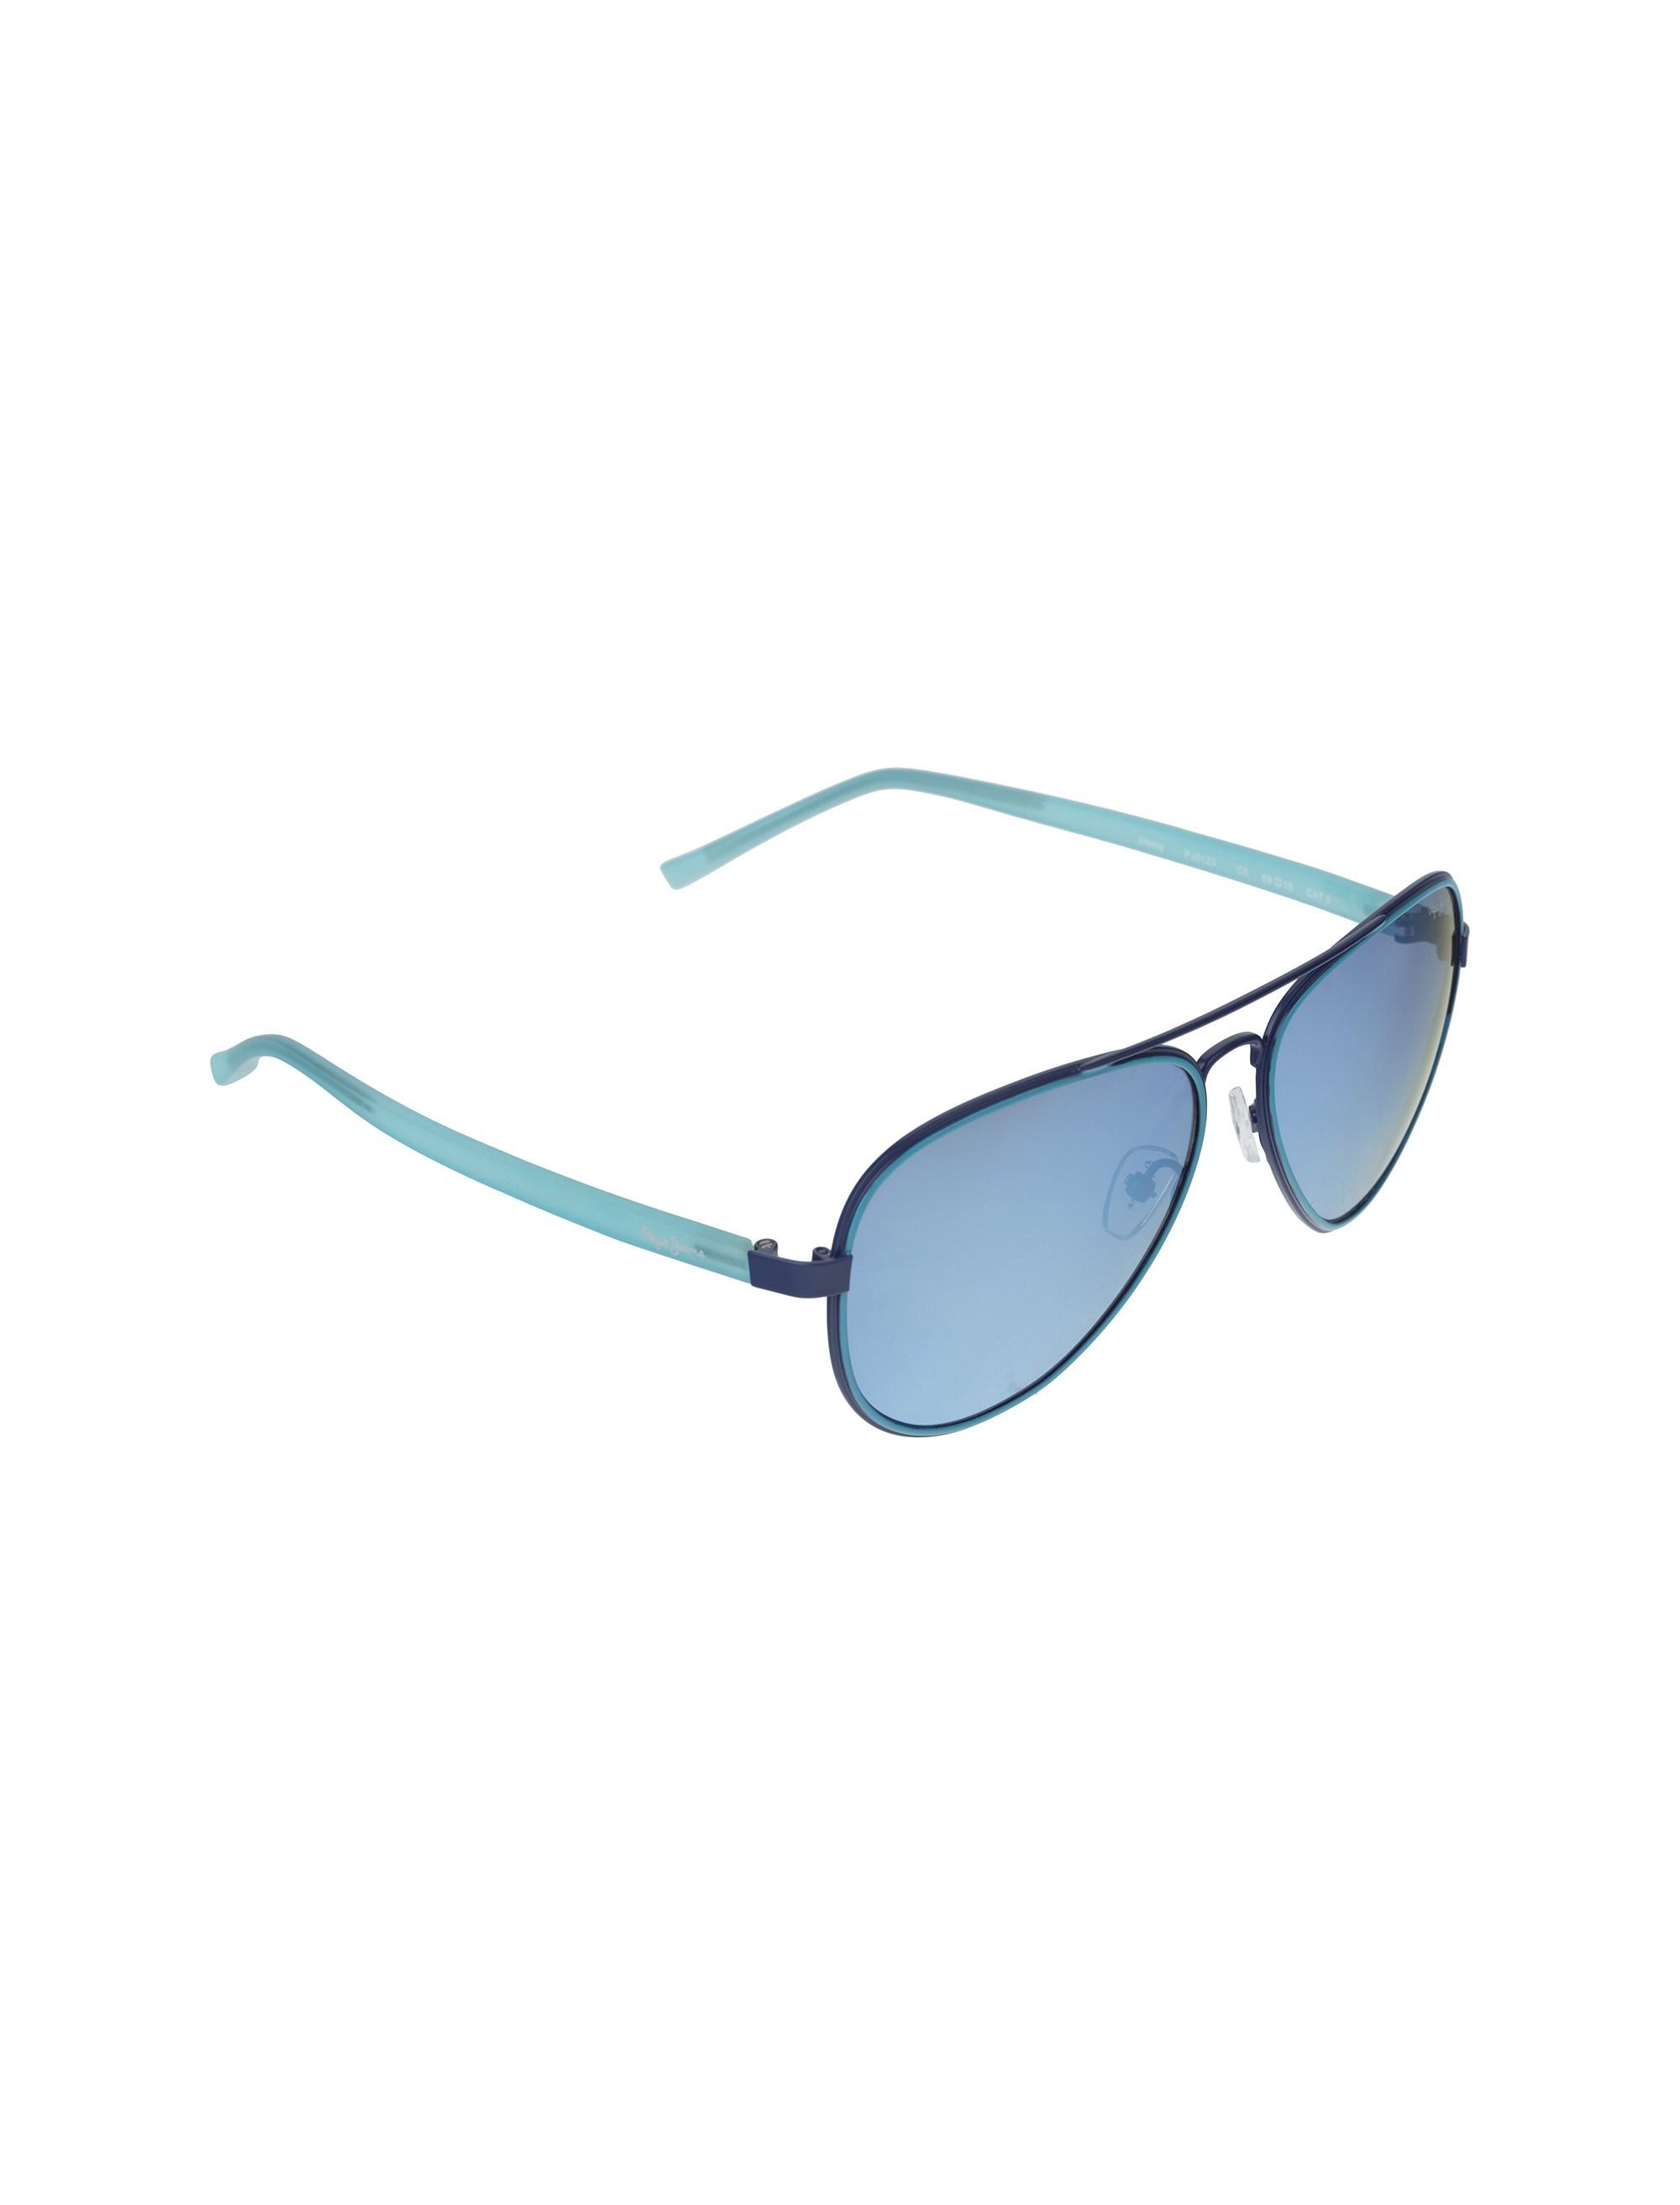 عینک آفتابی خلبانی زنانه - پپه جینز - آبي روشن - 2